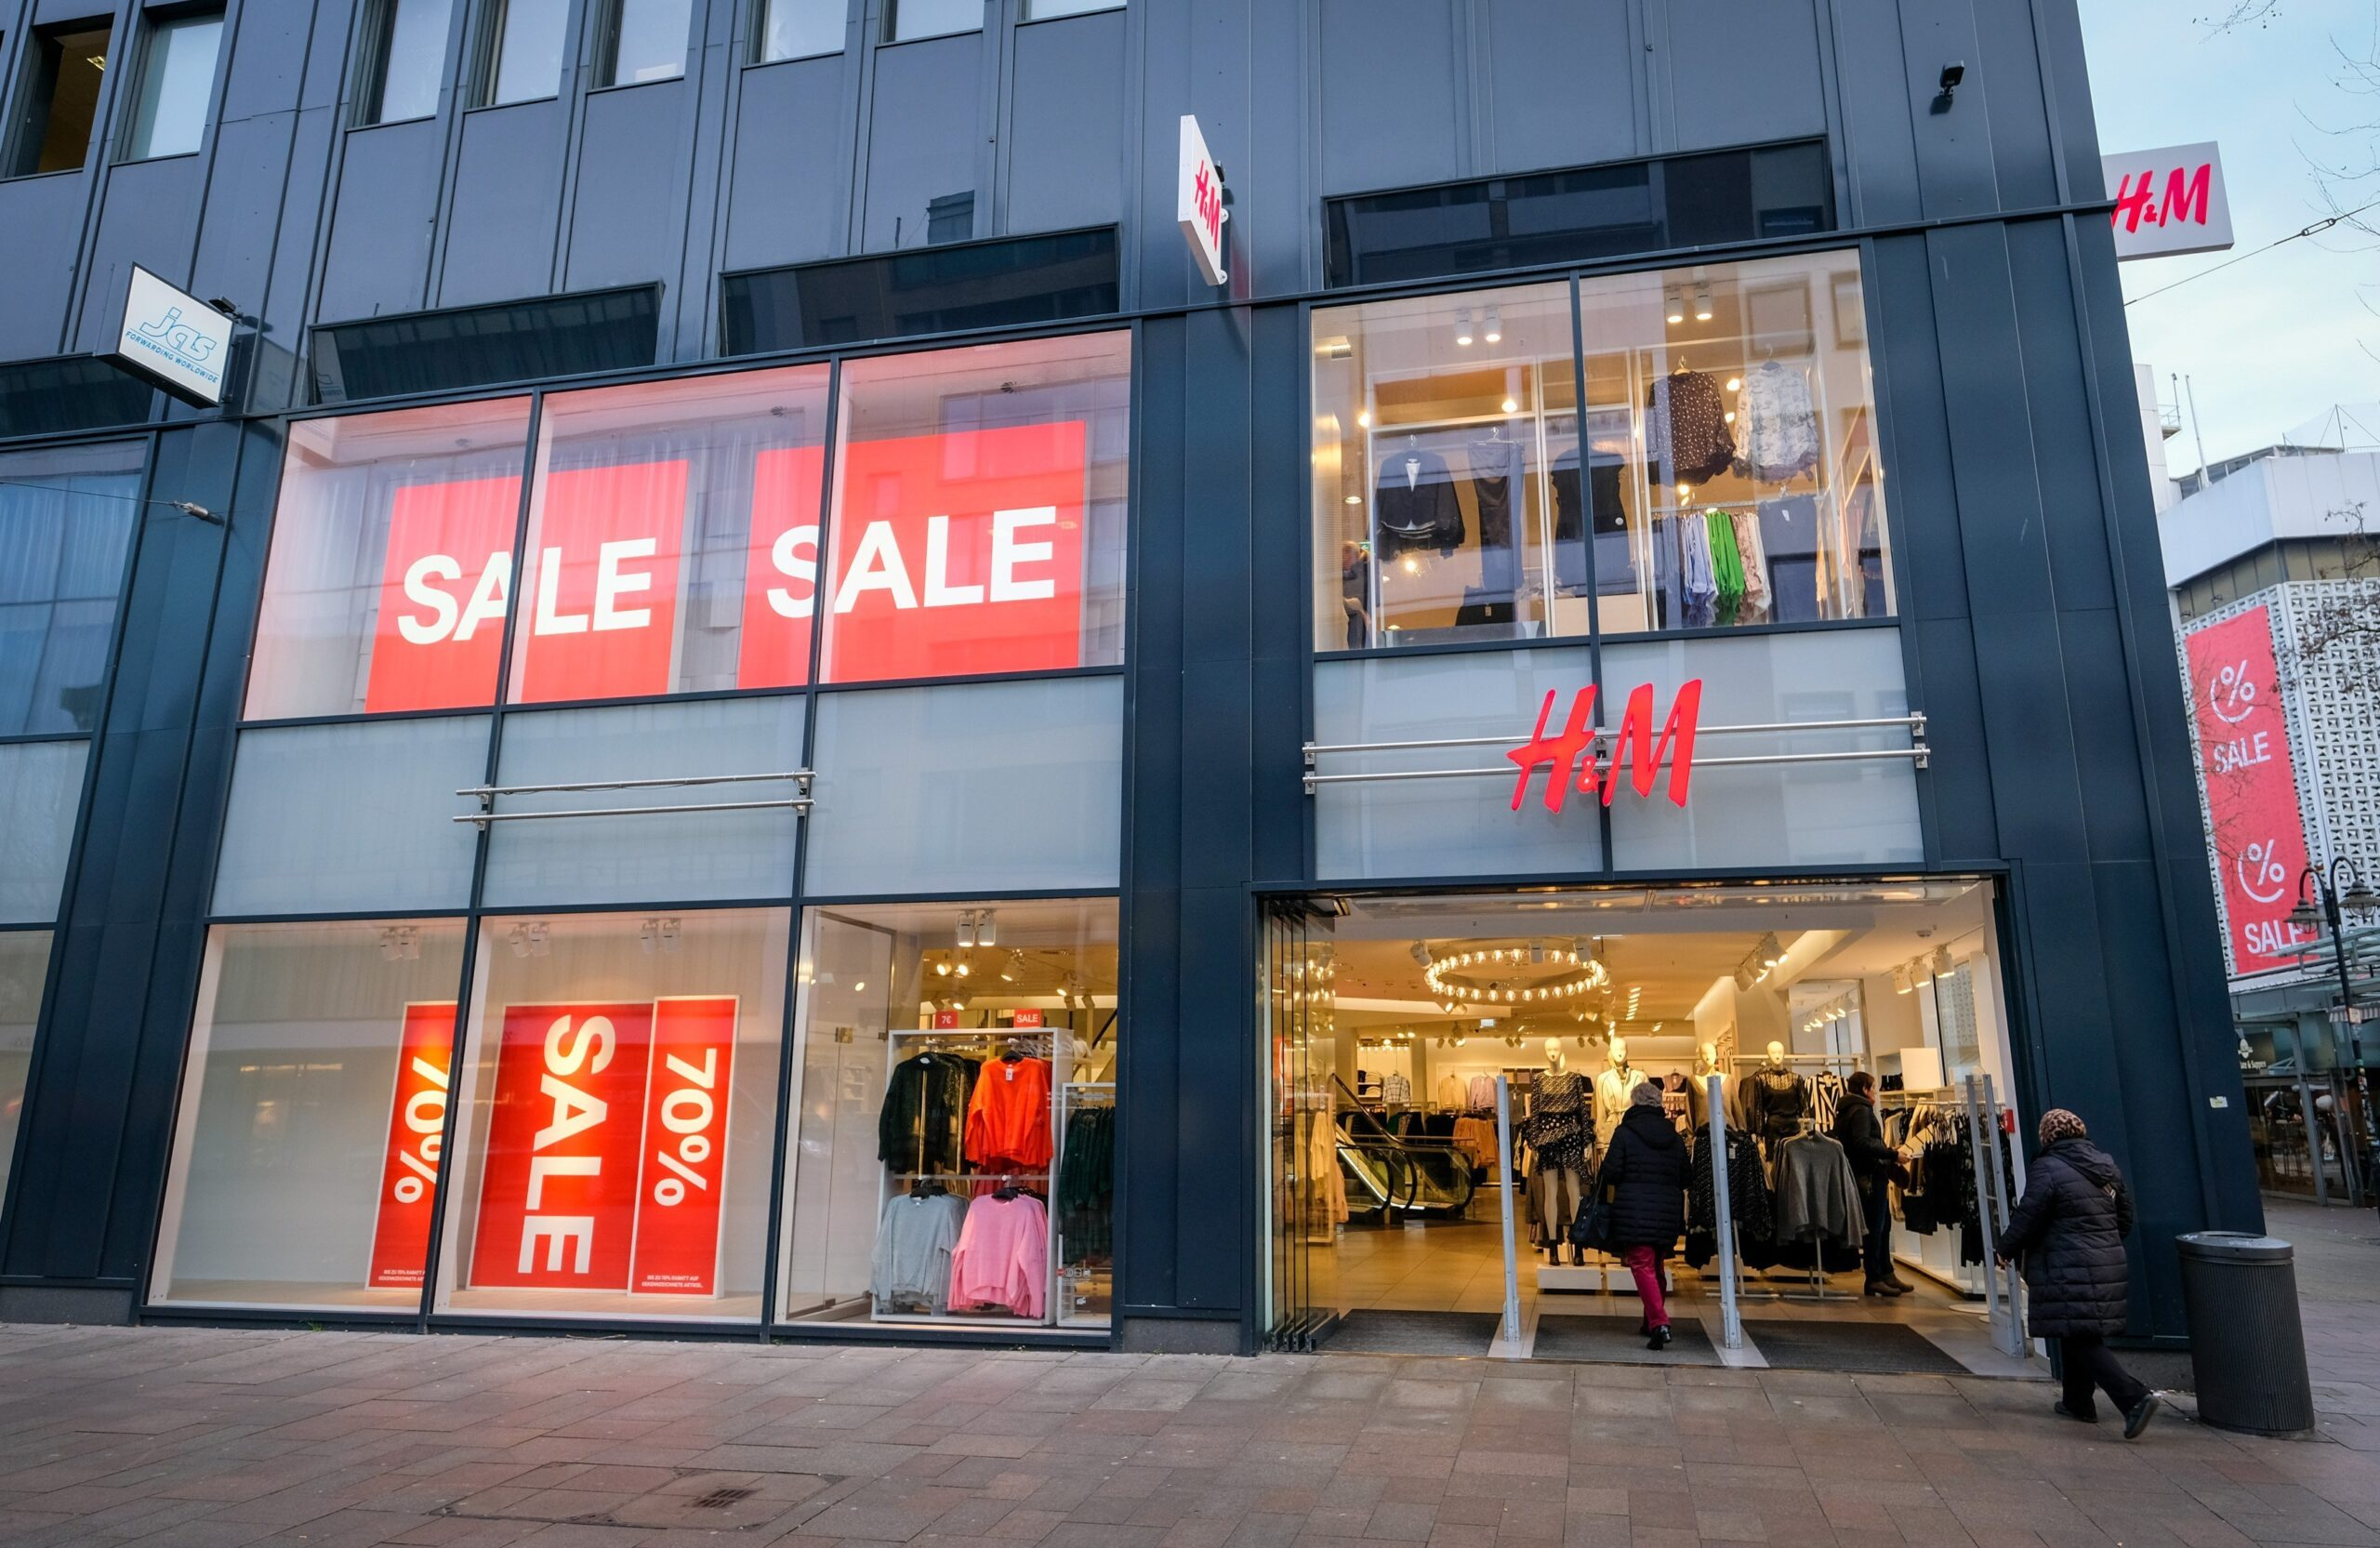 $4.3 Billion Worth of Unsold H&M Clothing